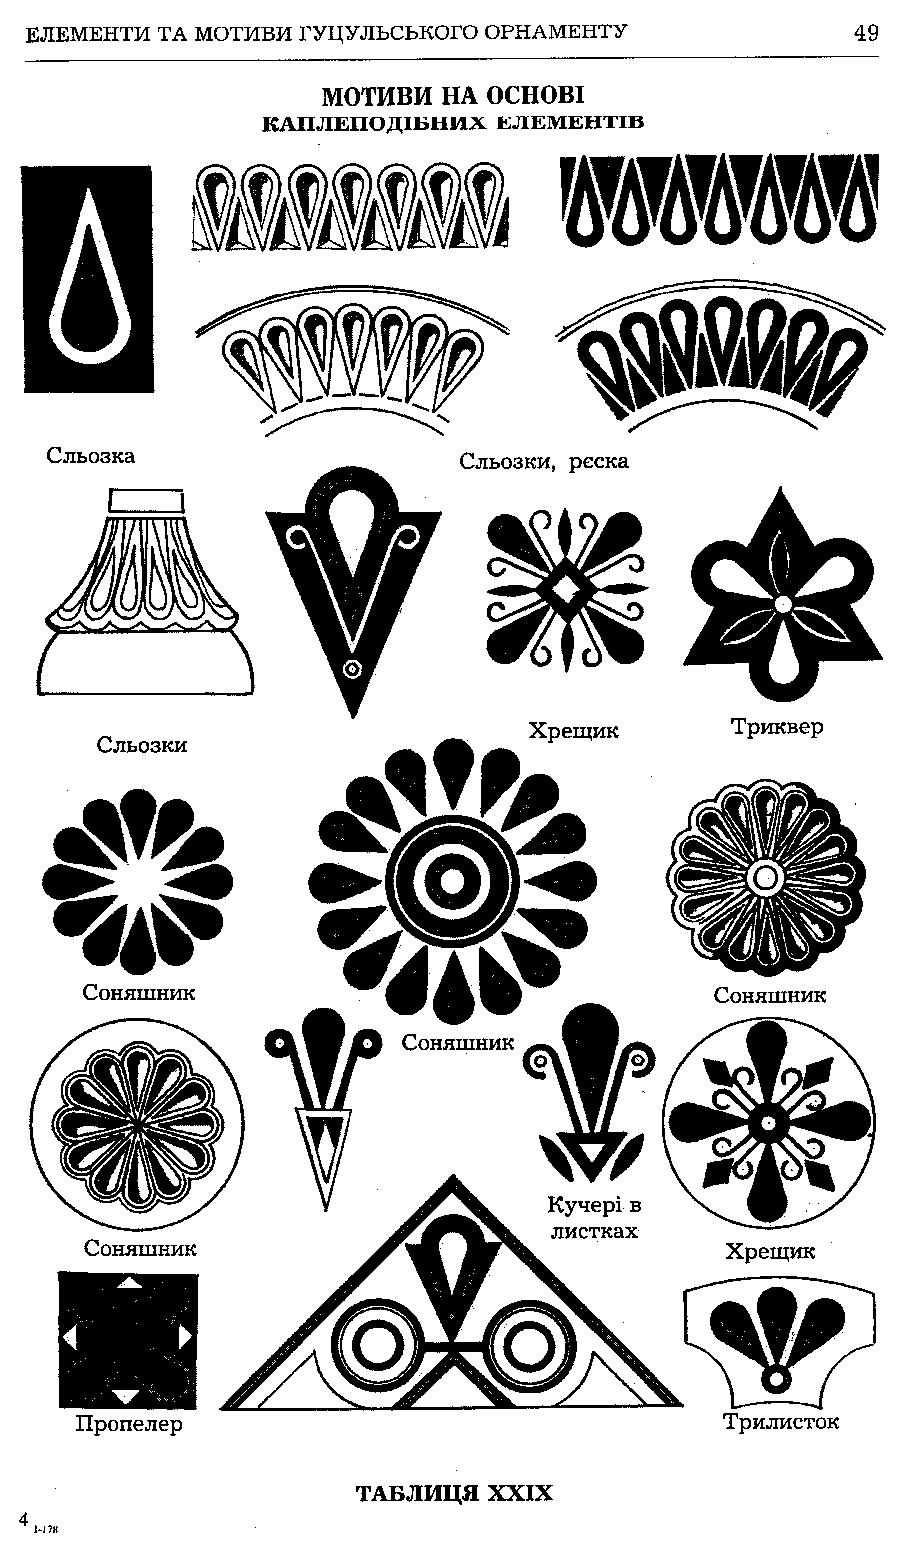 Tablitsya29-Motivi-na-osnovi-kapelepodibnih-elementiv